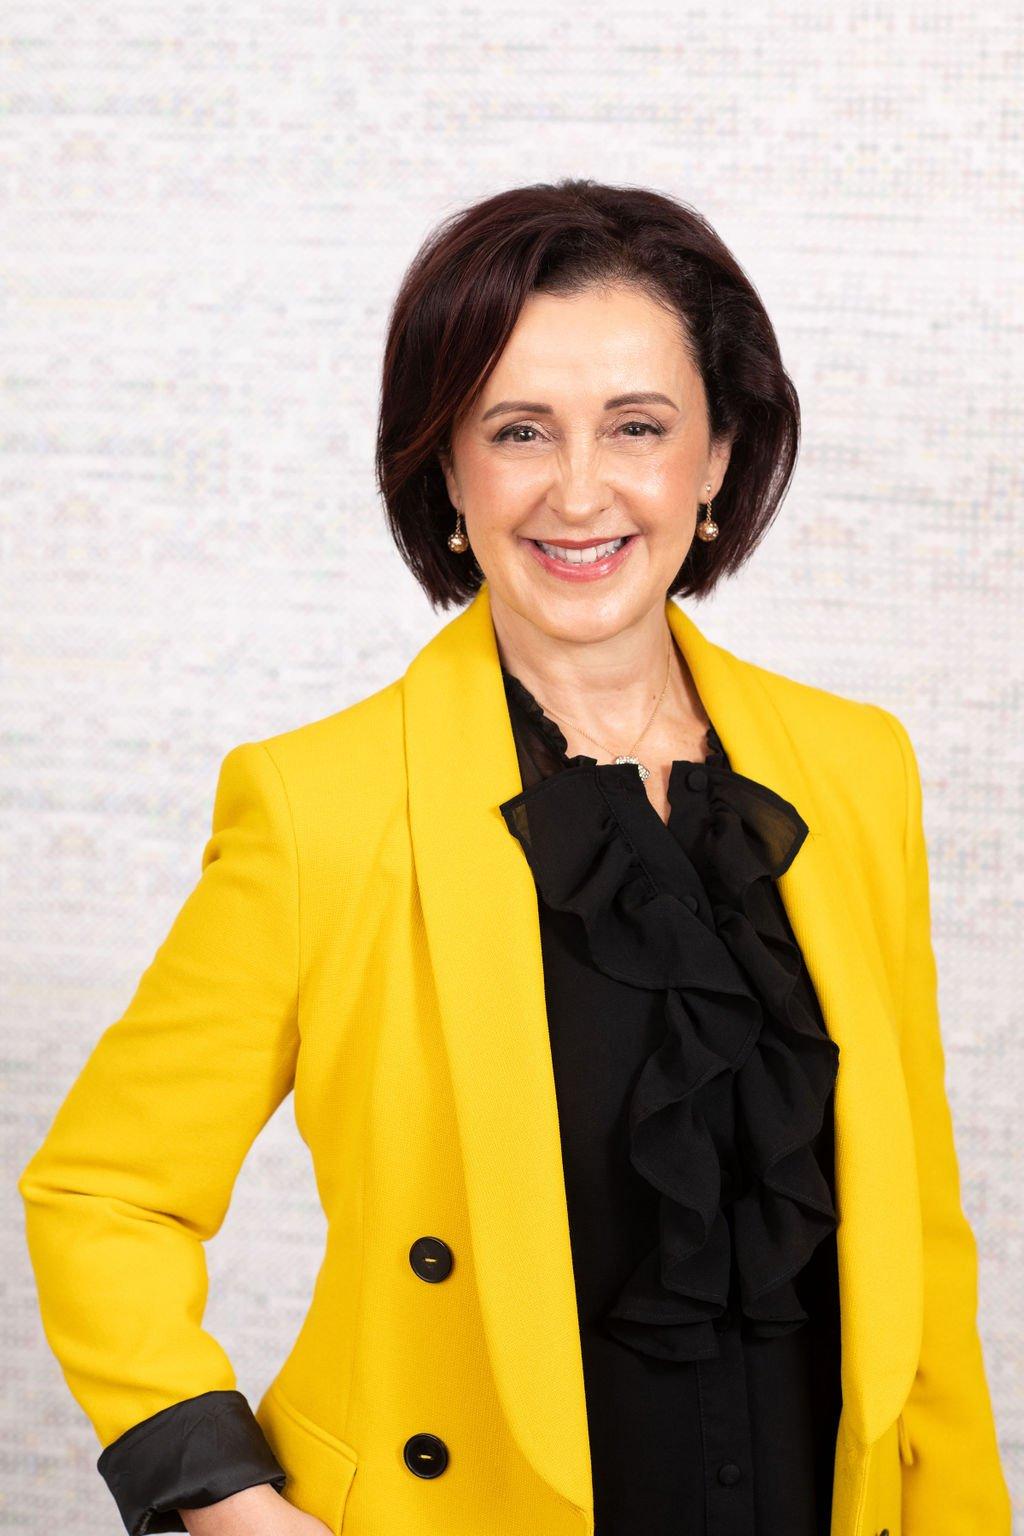 Dr. Denise Meyerson